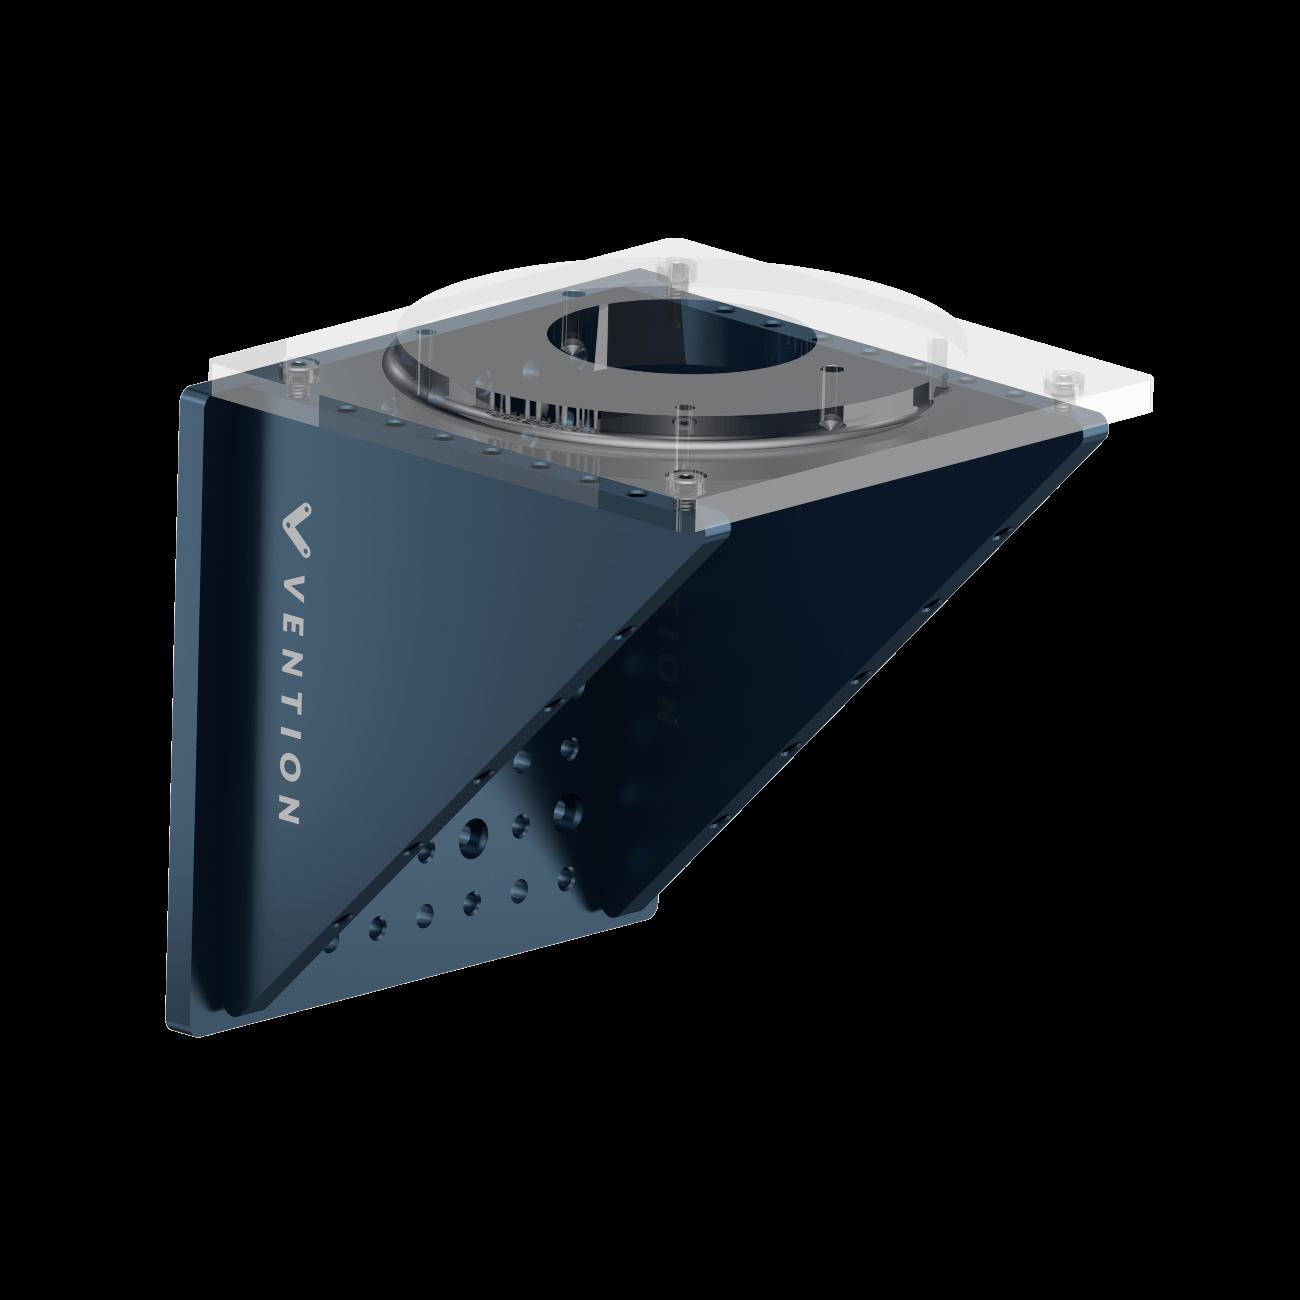 Configuration 2: Horizontal mount.